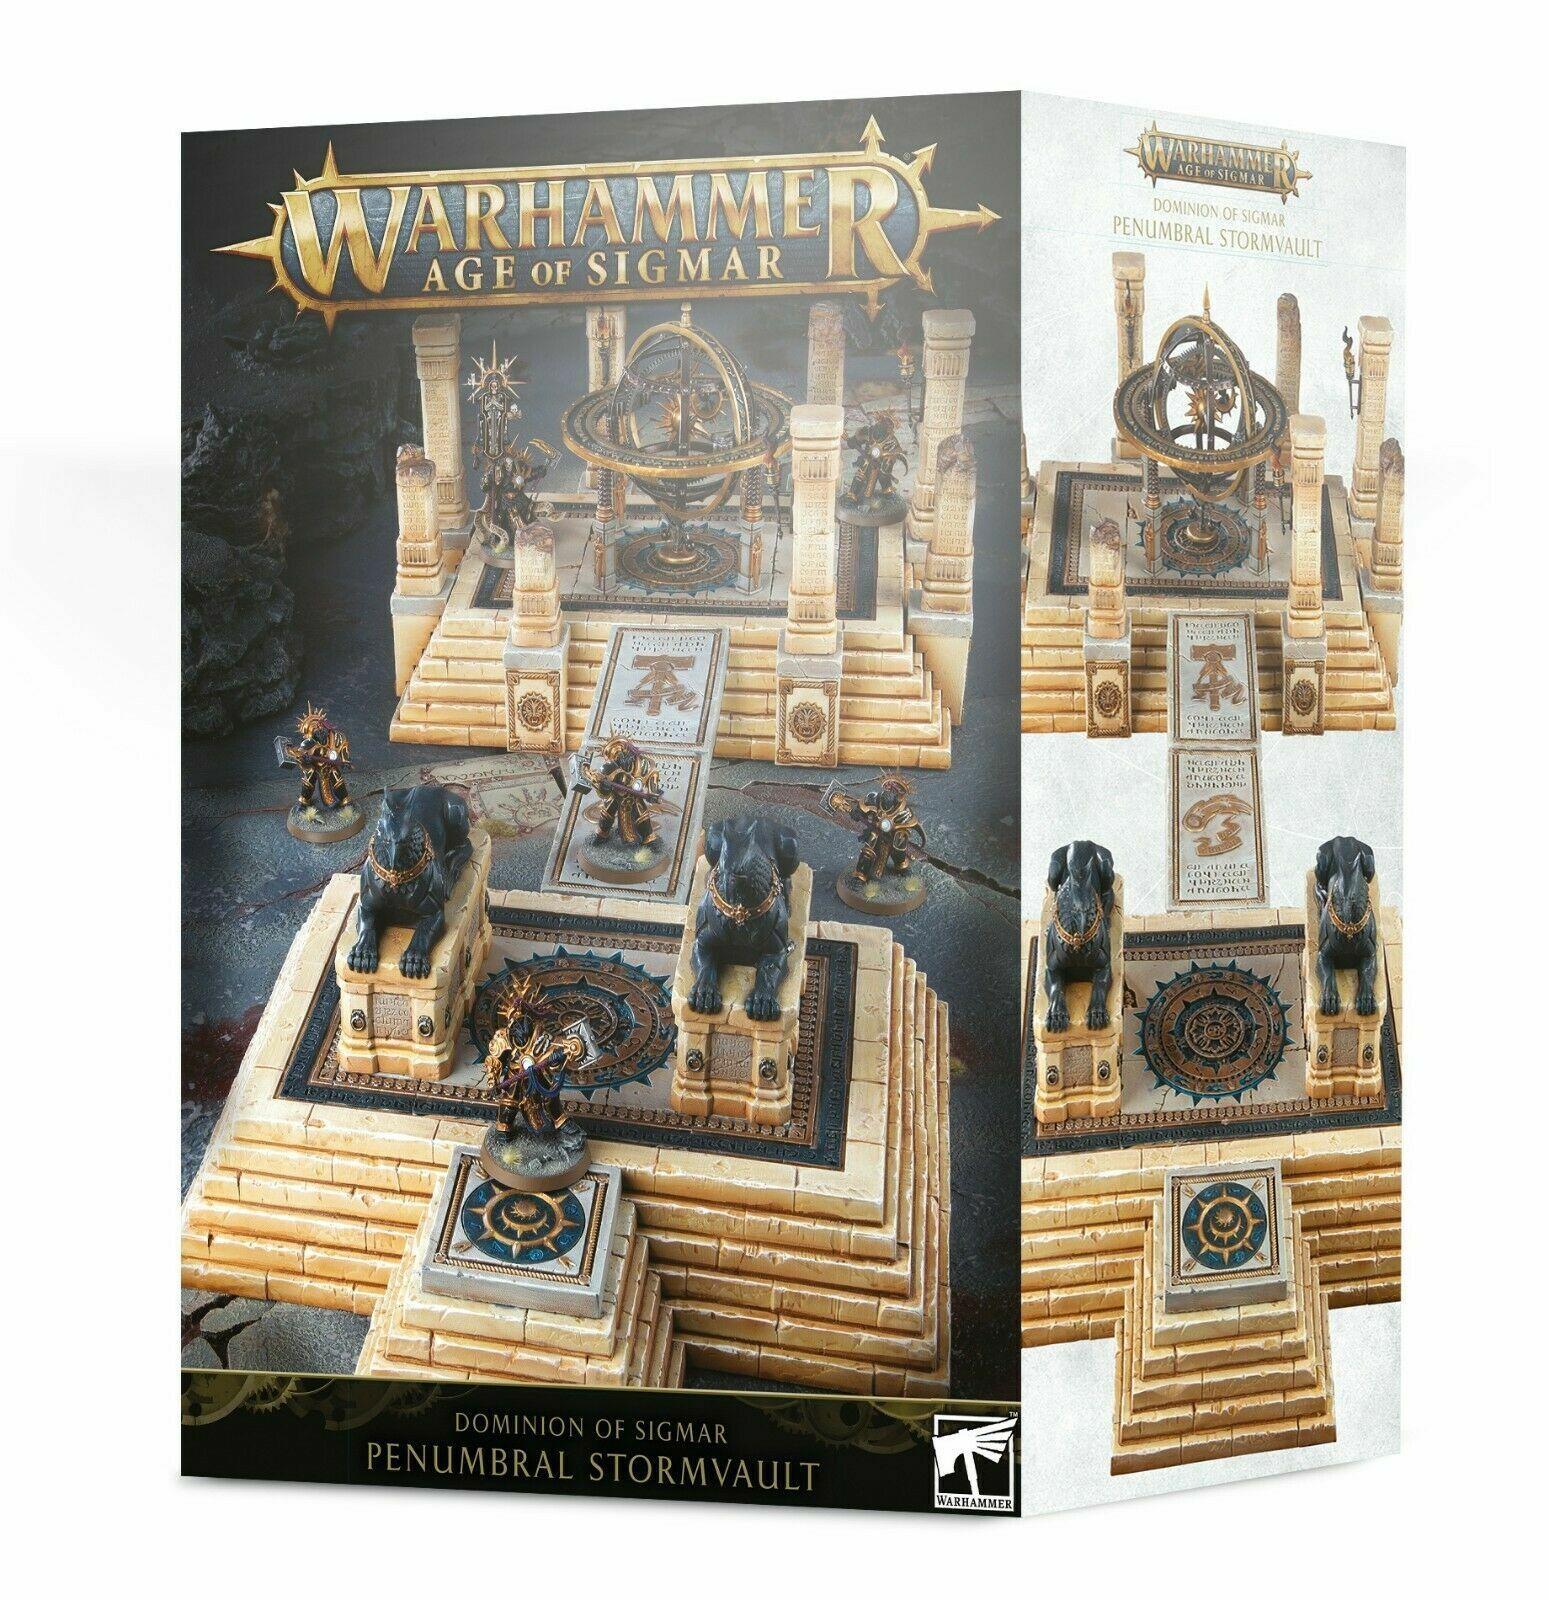 Dominion of Sigmar Penumbral Stormvault Terrain Warhammer AoS Games Workshop